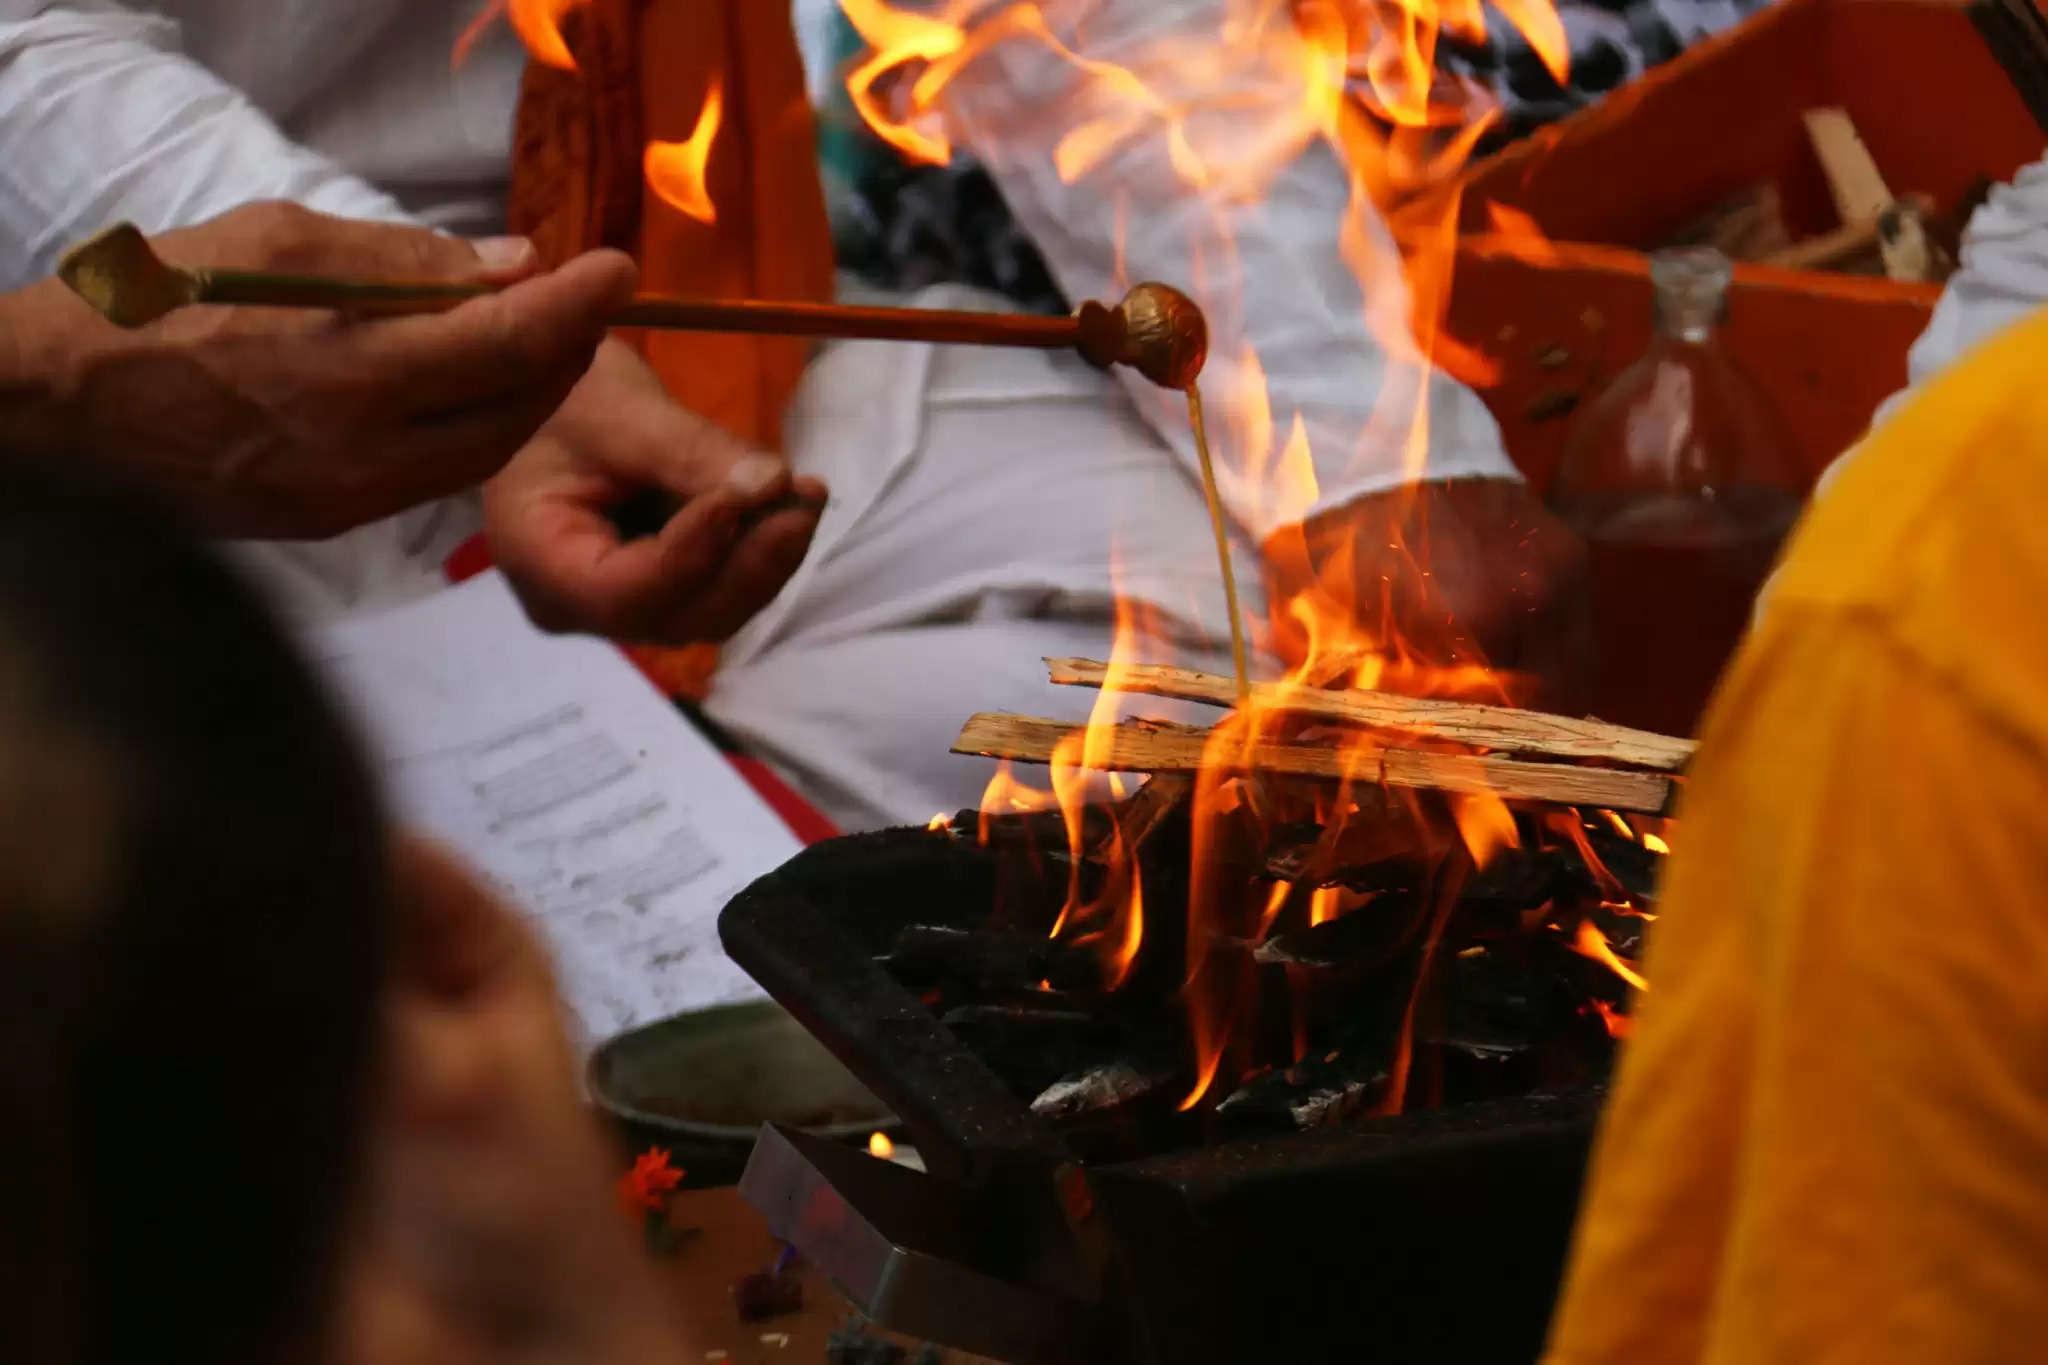 Navratri navami 2021 havan pujan shubh muhurat and vidhi and bhoj